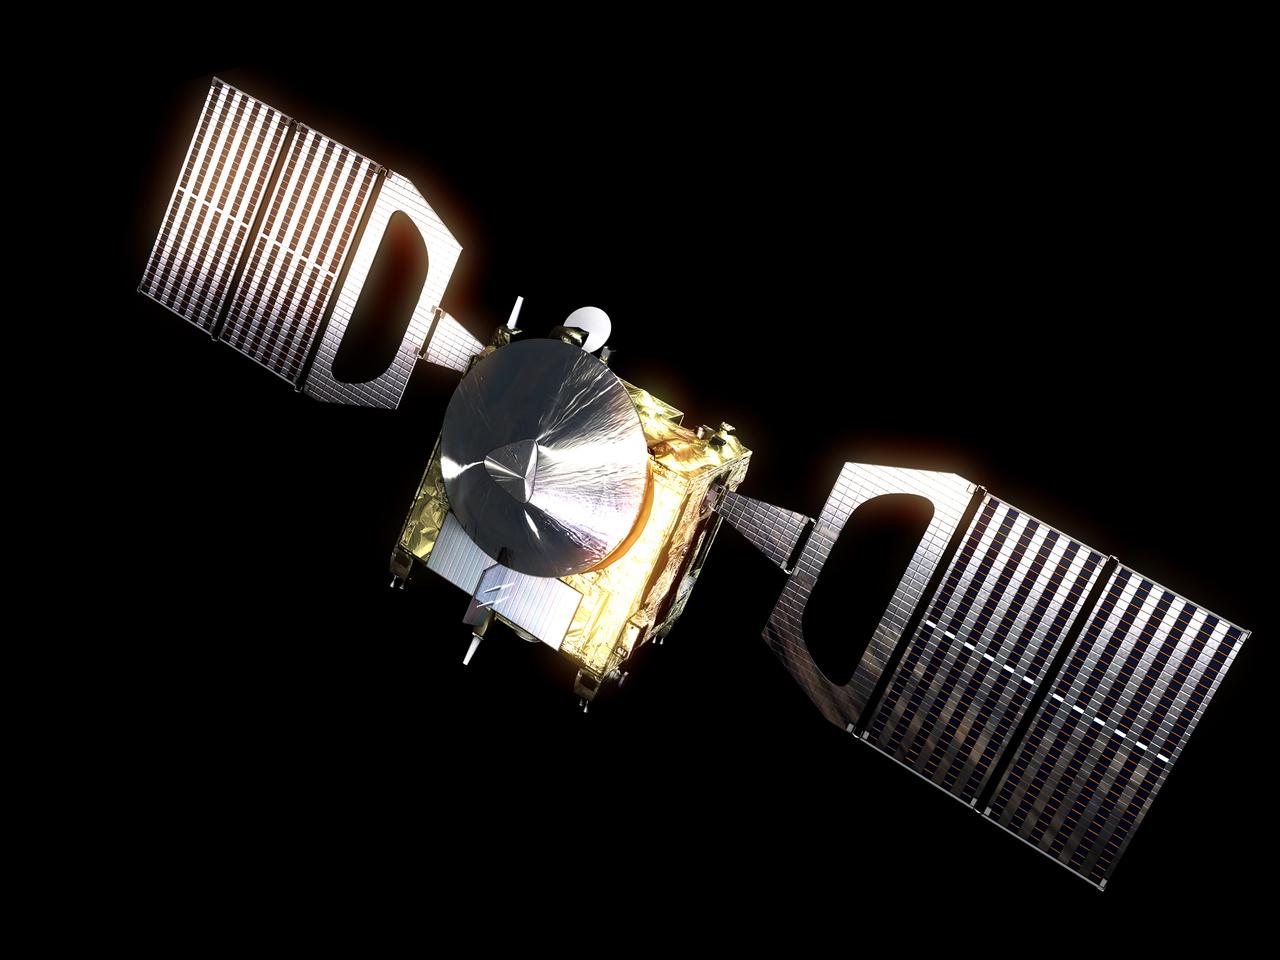 Artist's impression of ESA's Venus Express. Image credit: ESA.